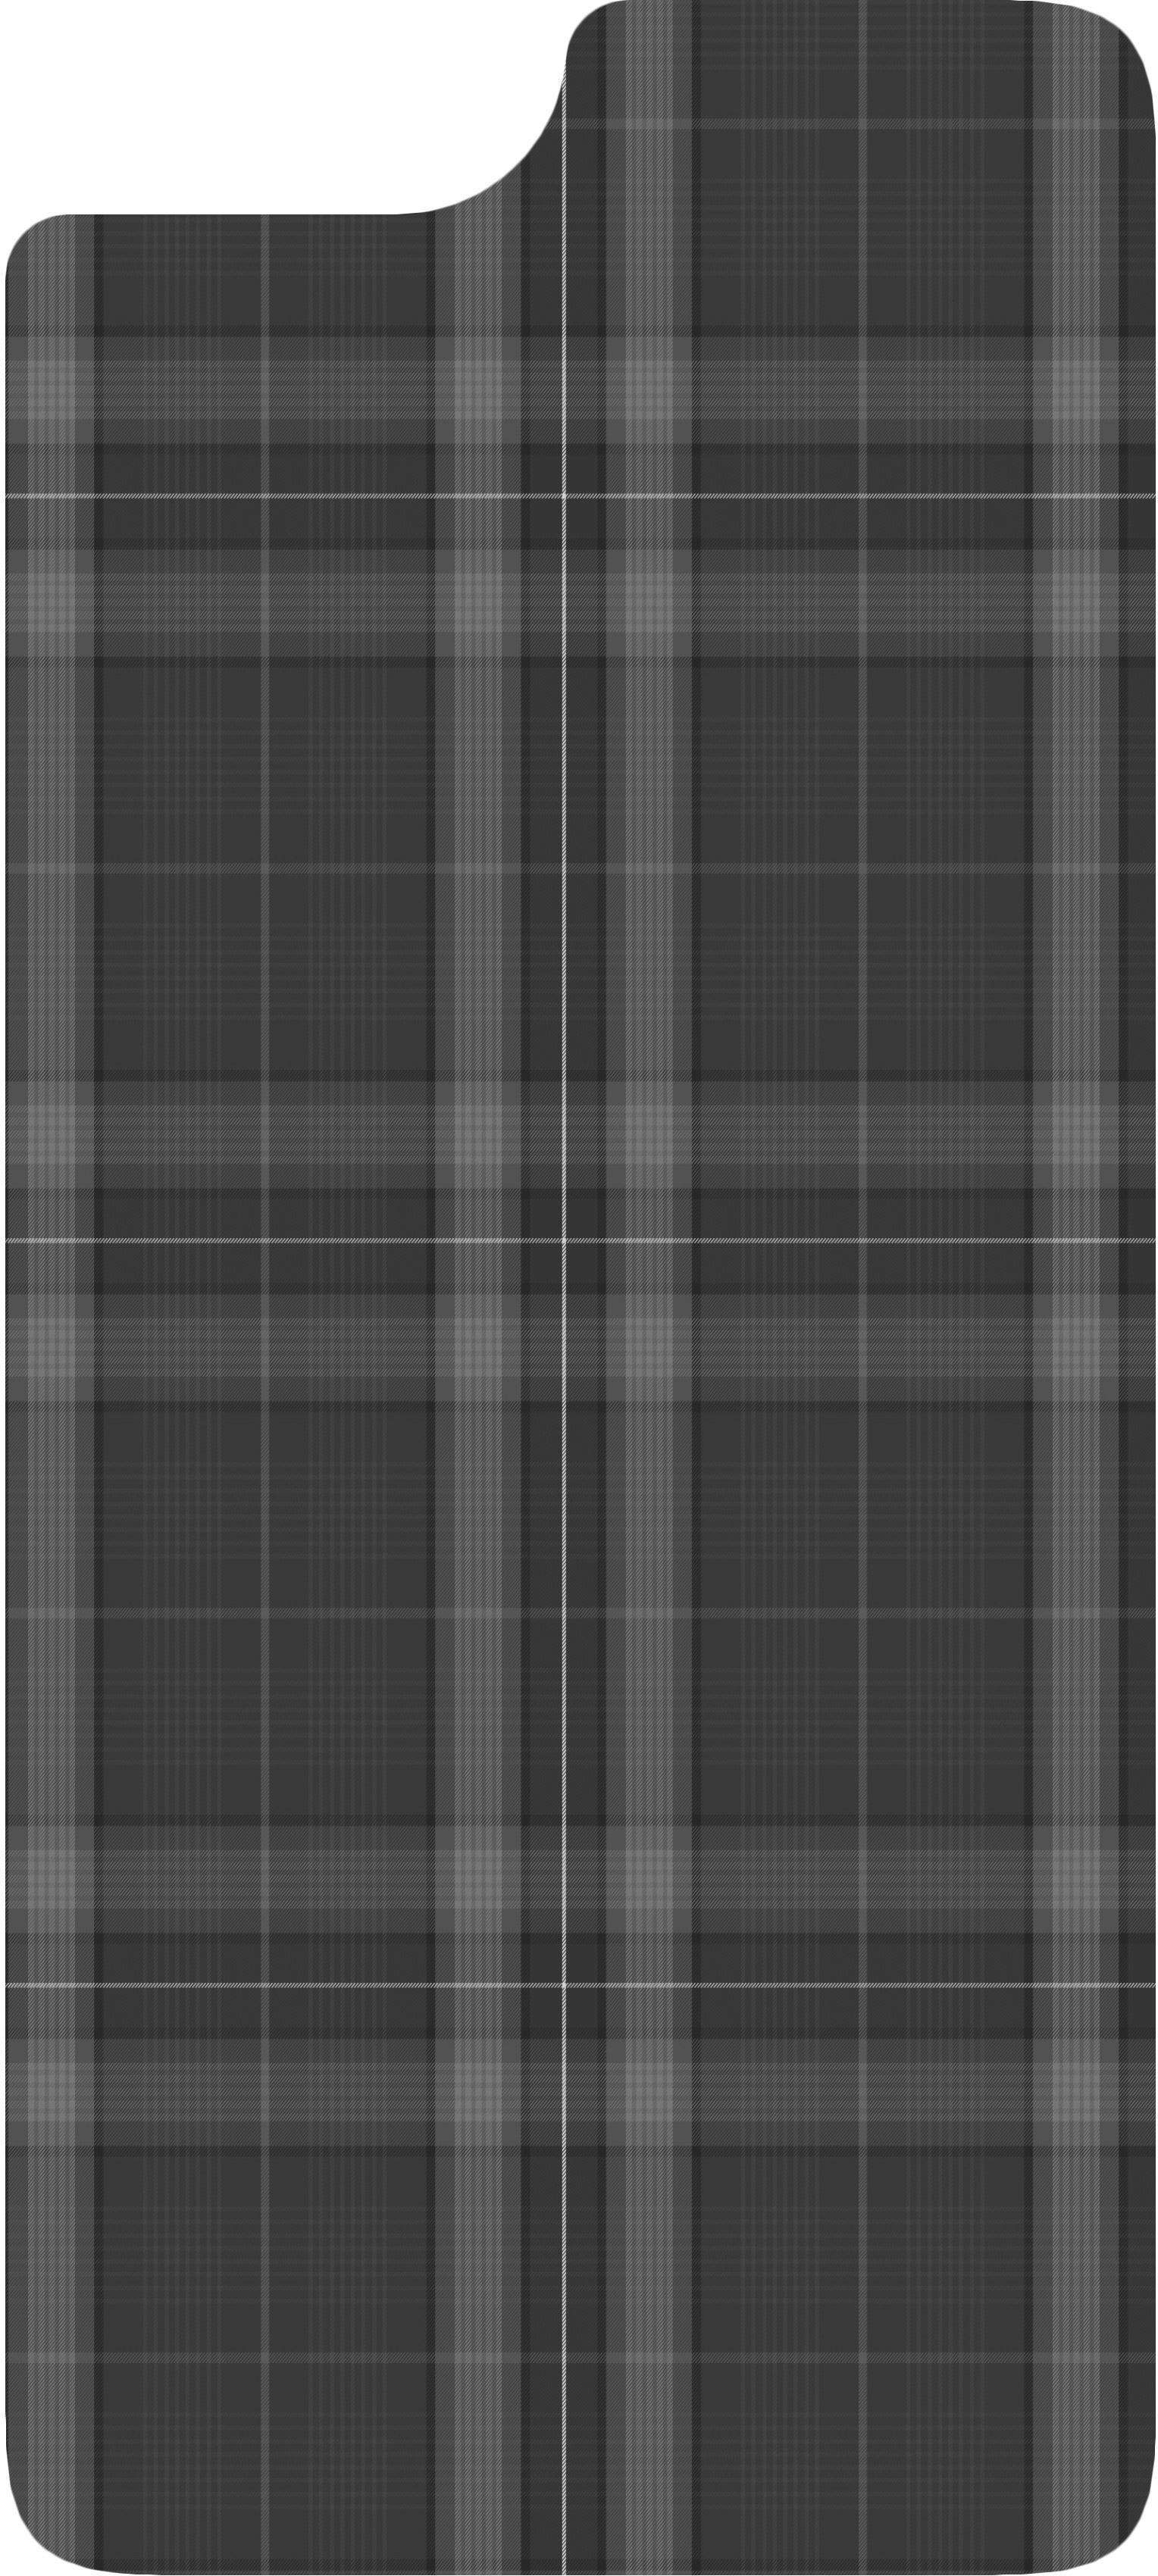 OtterBox MySymmetry Series Single Insert